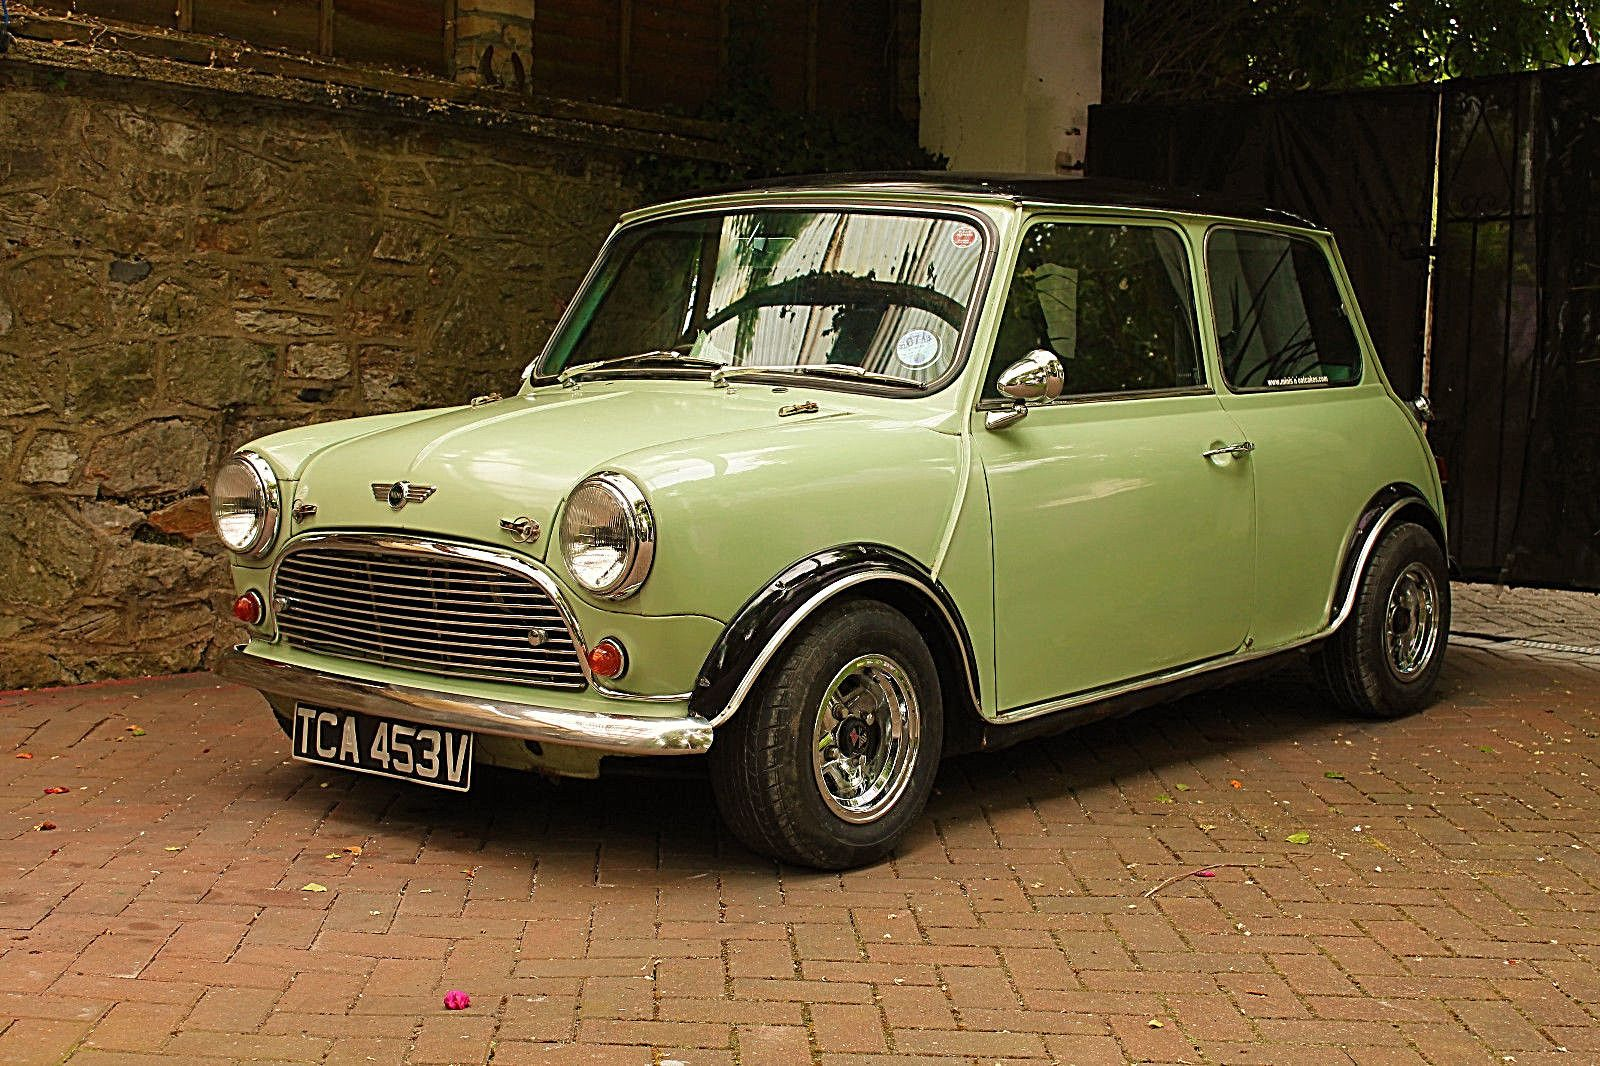 Ebay Mini 1000 1980 Great Looking Little Mini Classicmini Mini Classic Mini Mini Cars For Sale Mini